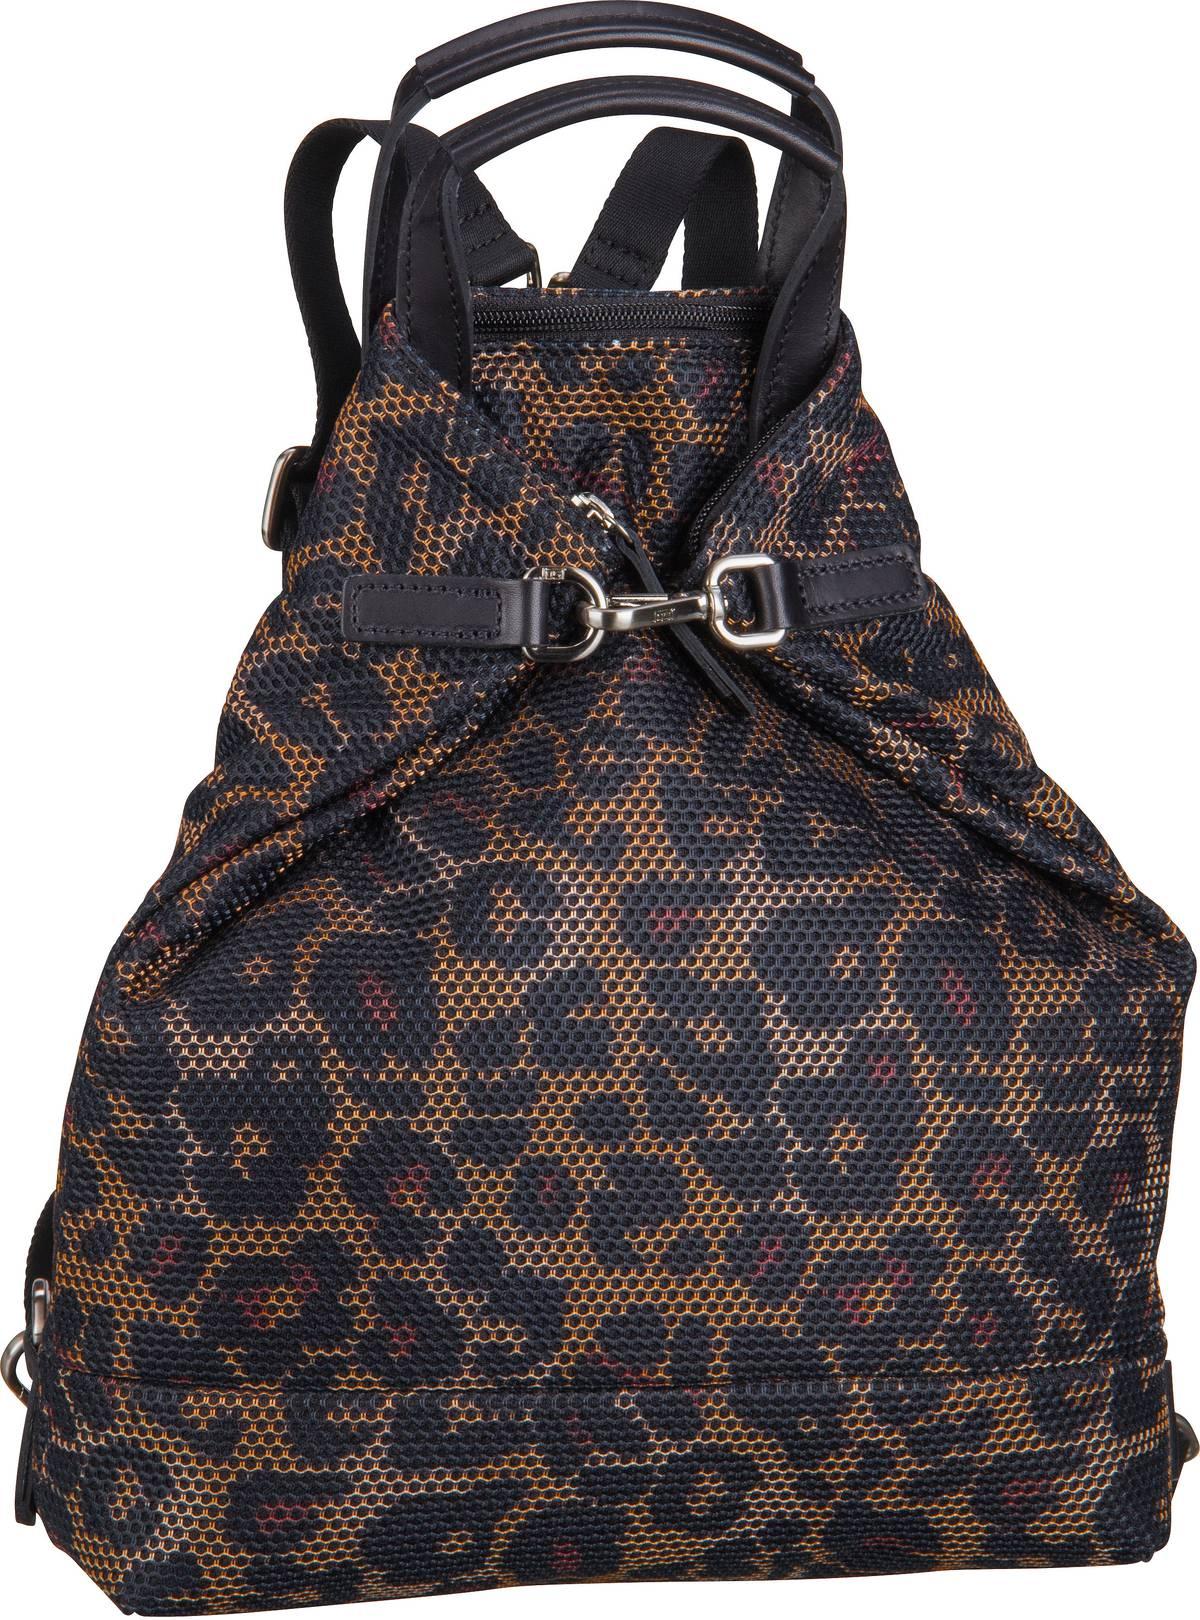 Rucksack / Daypack Mesh 6177 X-Change 3in1 Bag XS Leo